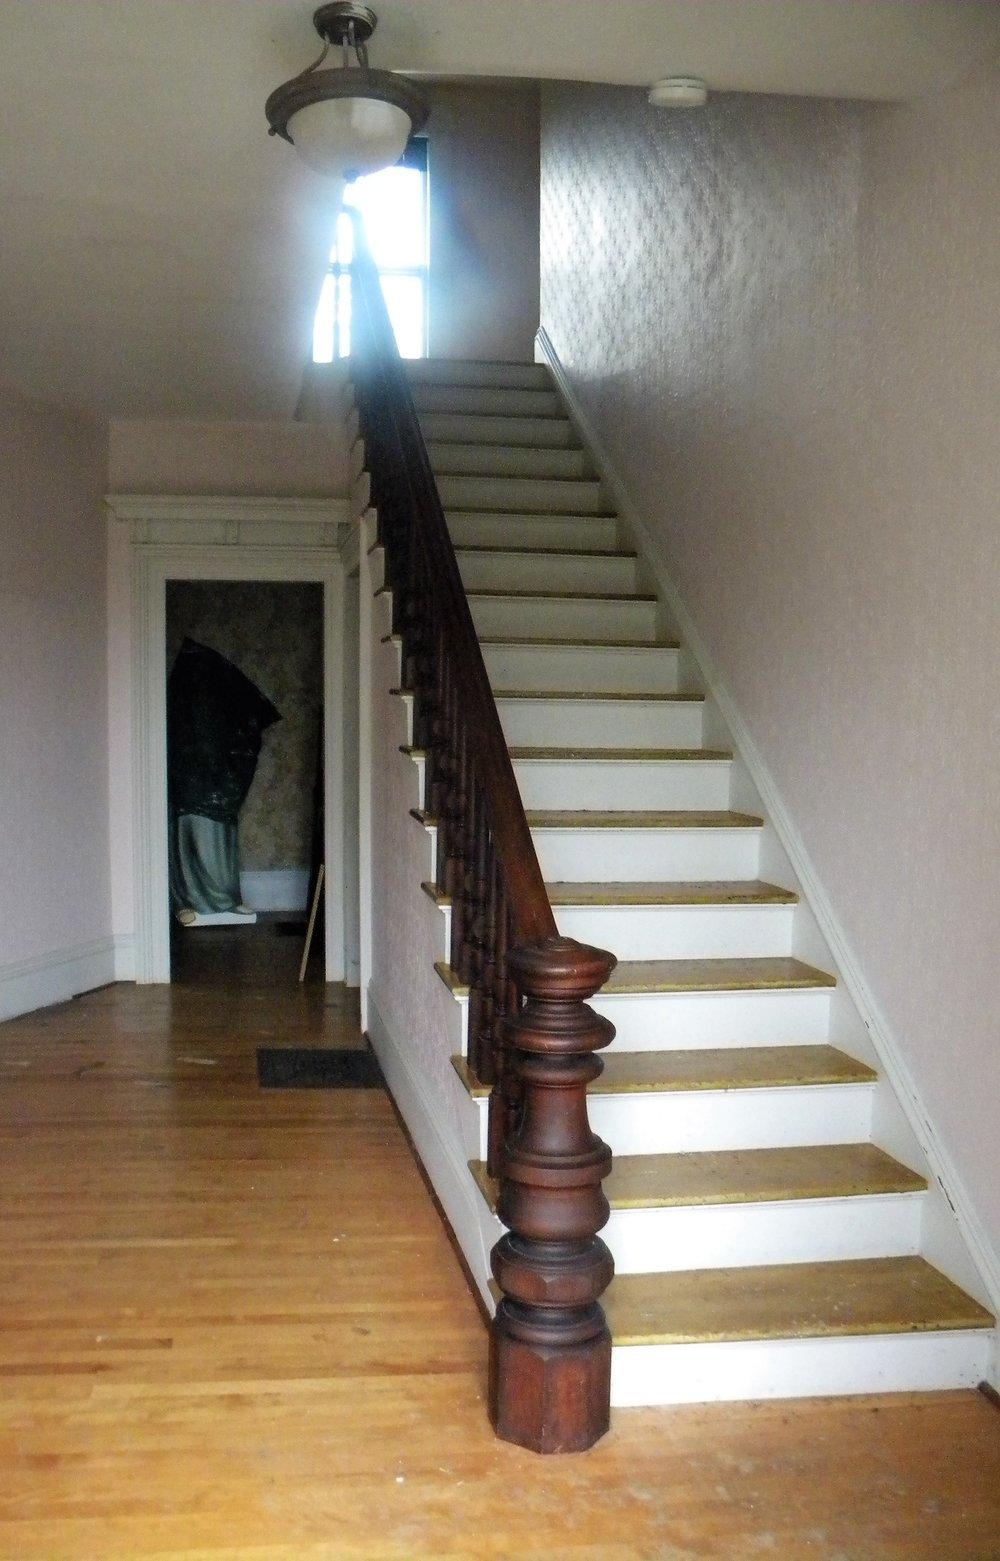 McGlashan-Nickerson Main Entry Stair.jpg